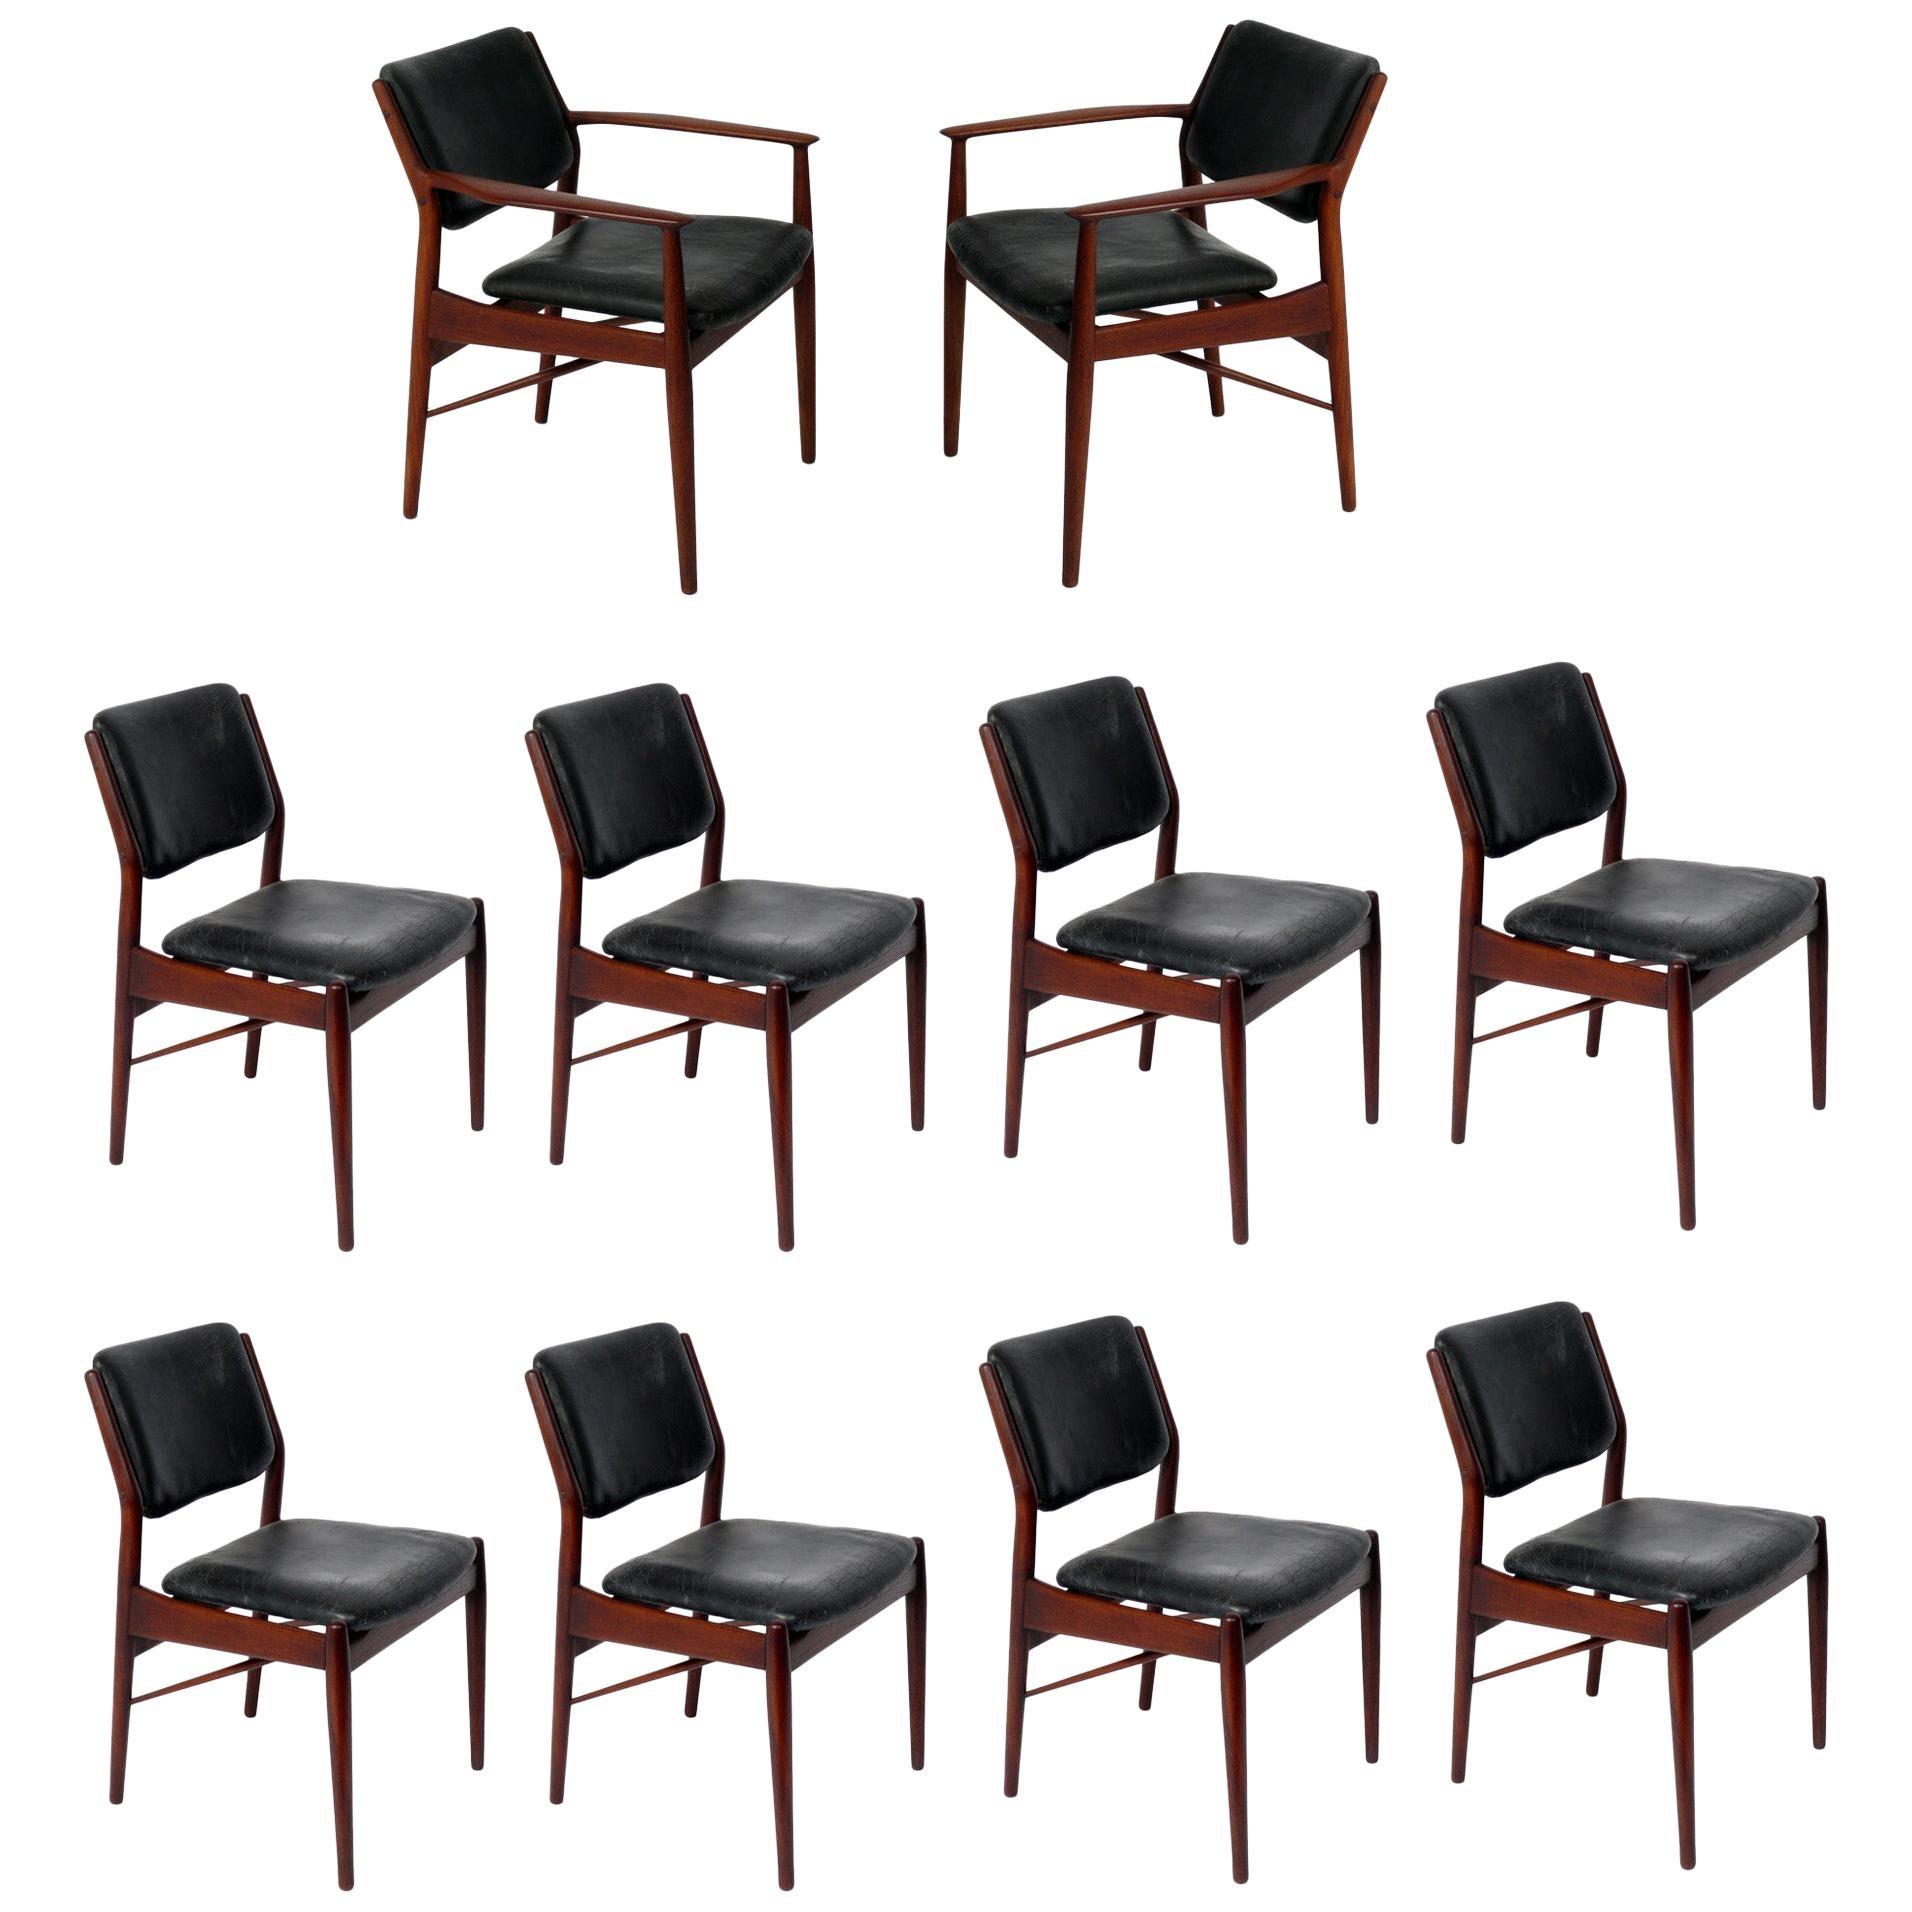 Danish Modern Dining Chairs by Arne Vodder Set of Ten